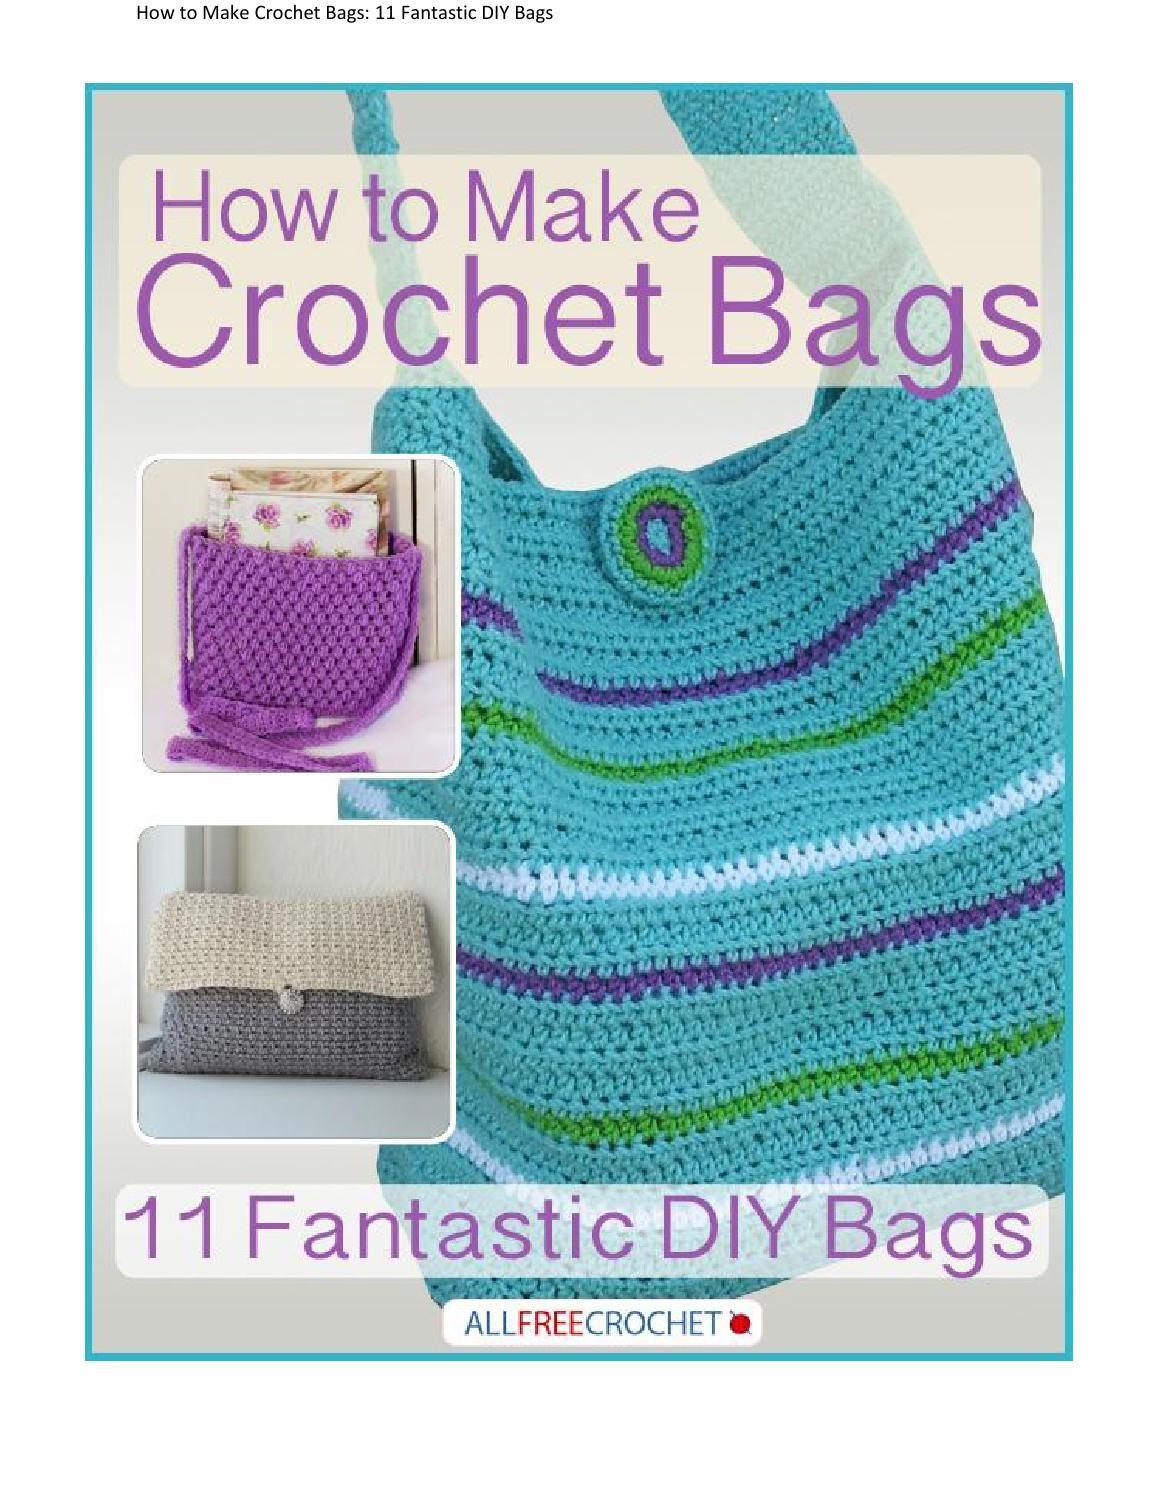 How to make crochet bags 11 fantastic diy bags free ebook how to make crochet bags 11 fantastic diy bags free ebook bankloansurffo Gallery